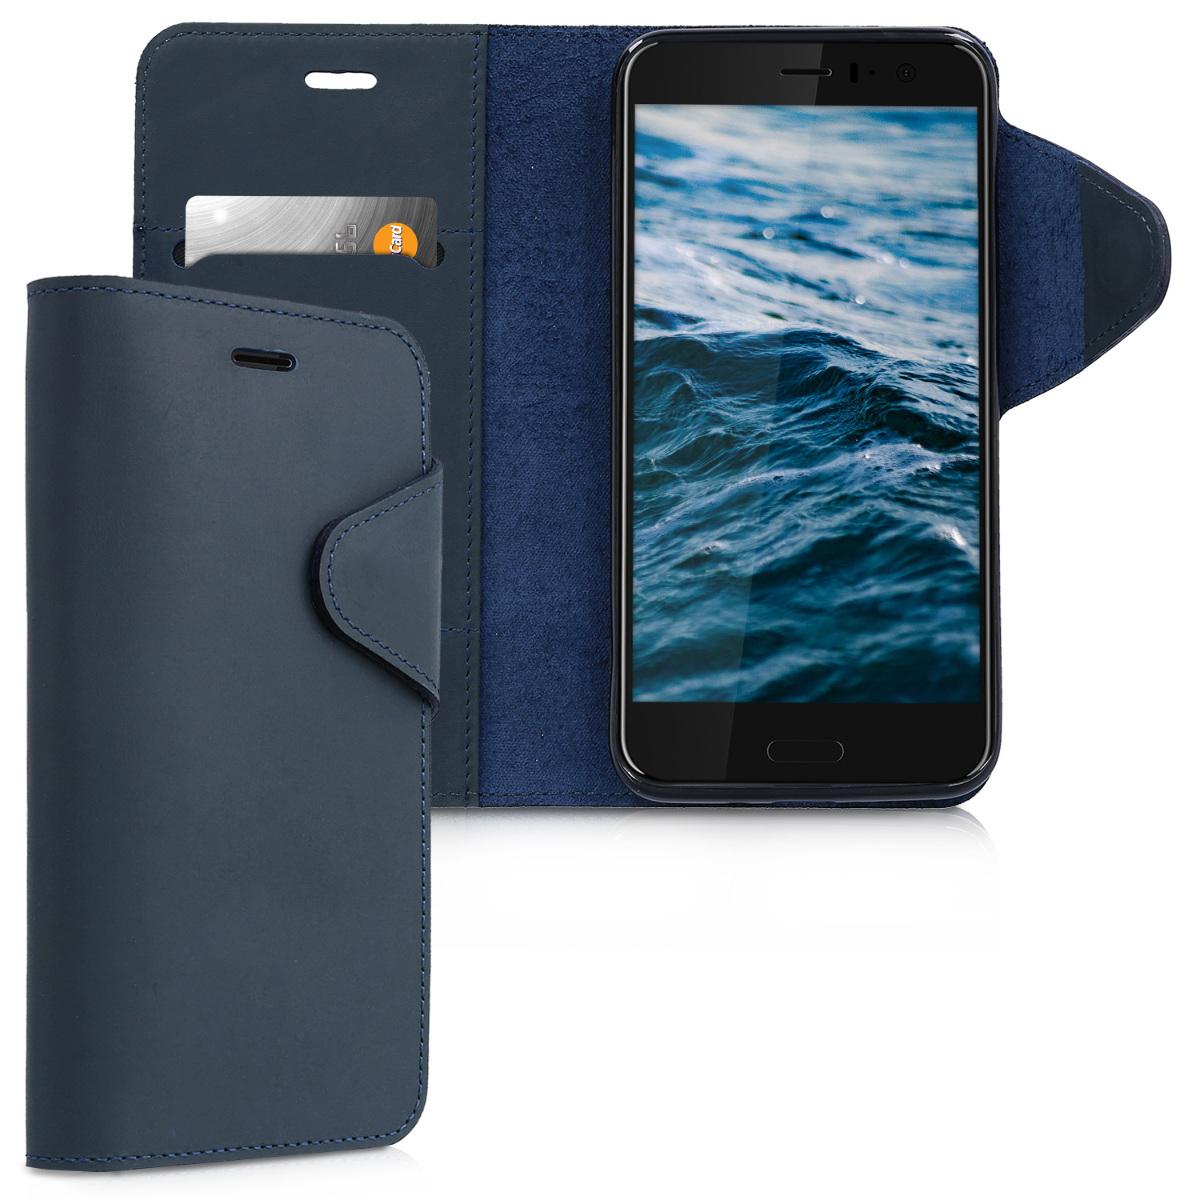 Kalibri Δερμάτινη Θήκη - Πορτοφόλι HTC U11 - Dark Blue (42899.17)